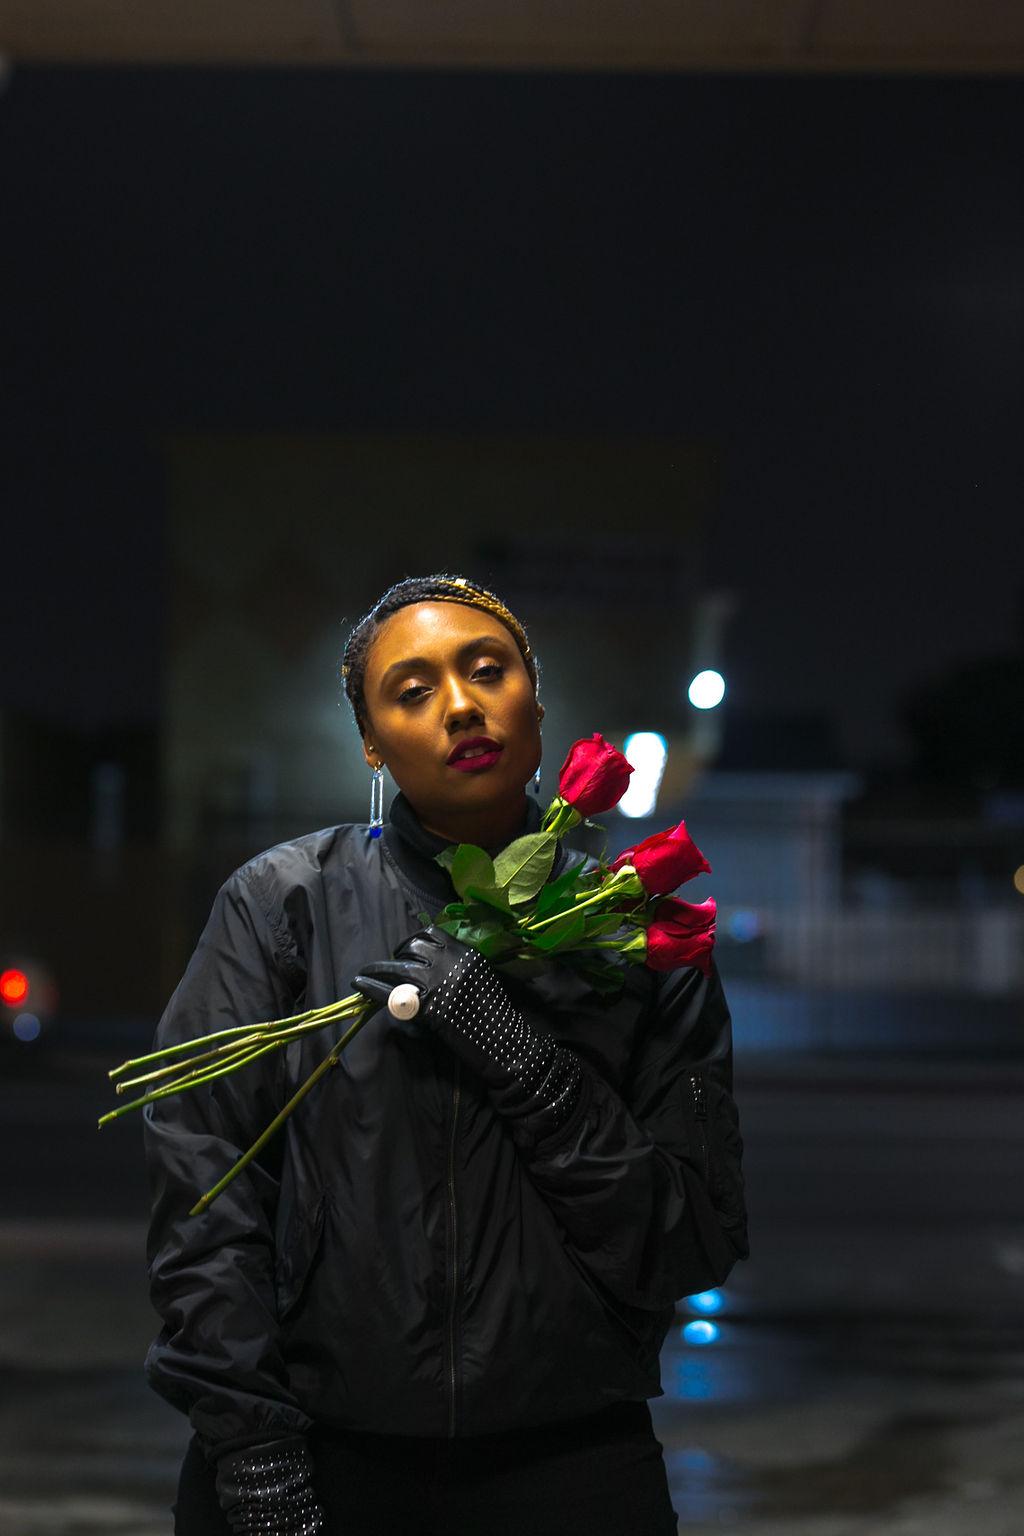 roses-night photography shoot